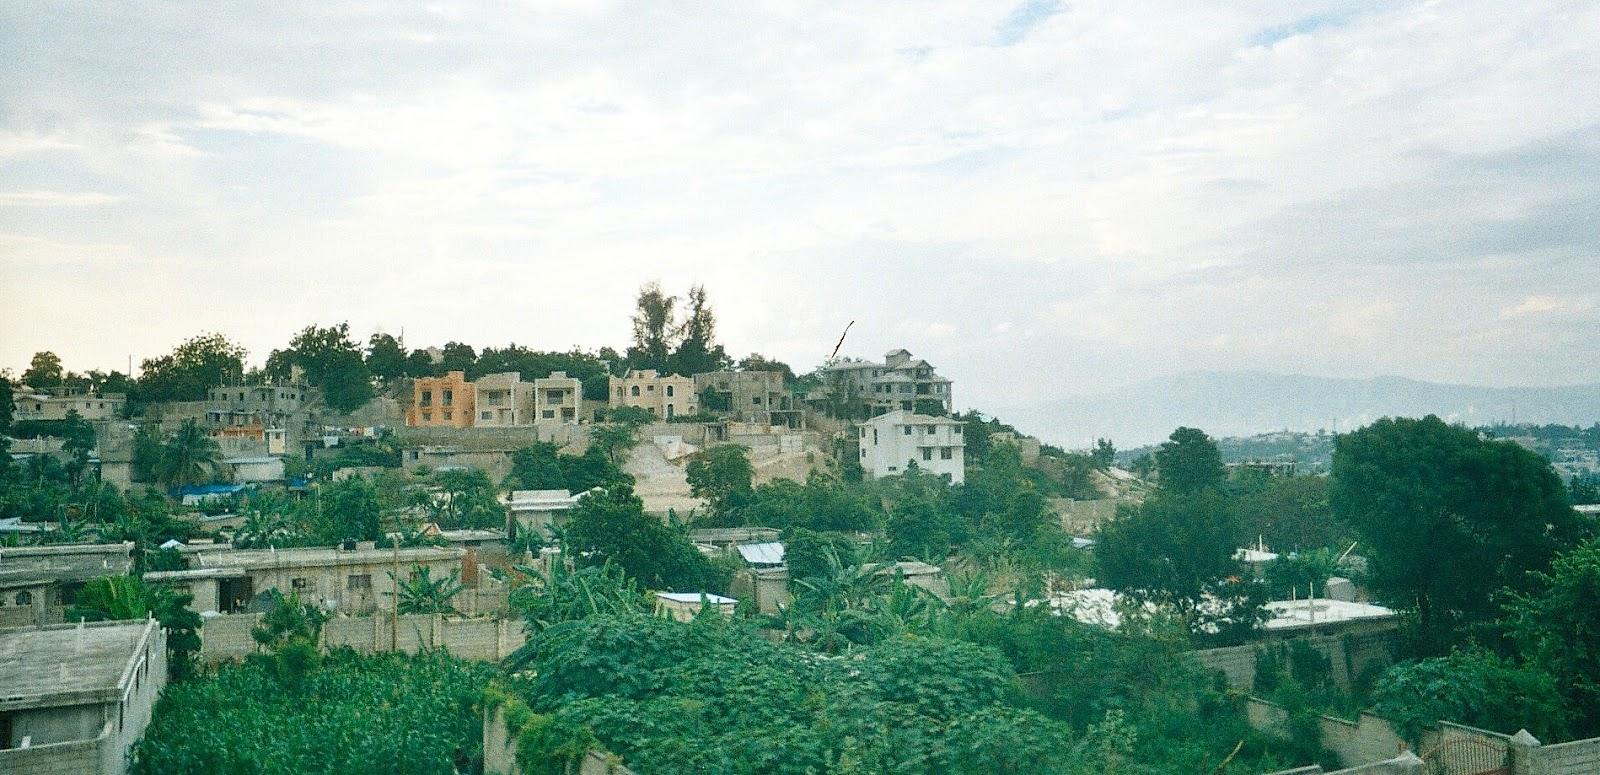 missions trip to haiti VIA TAYLORKRISTIINA.COM